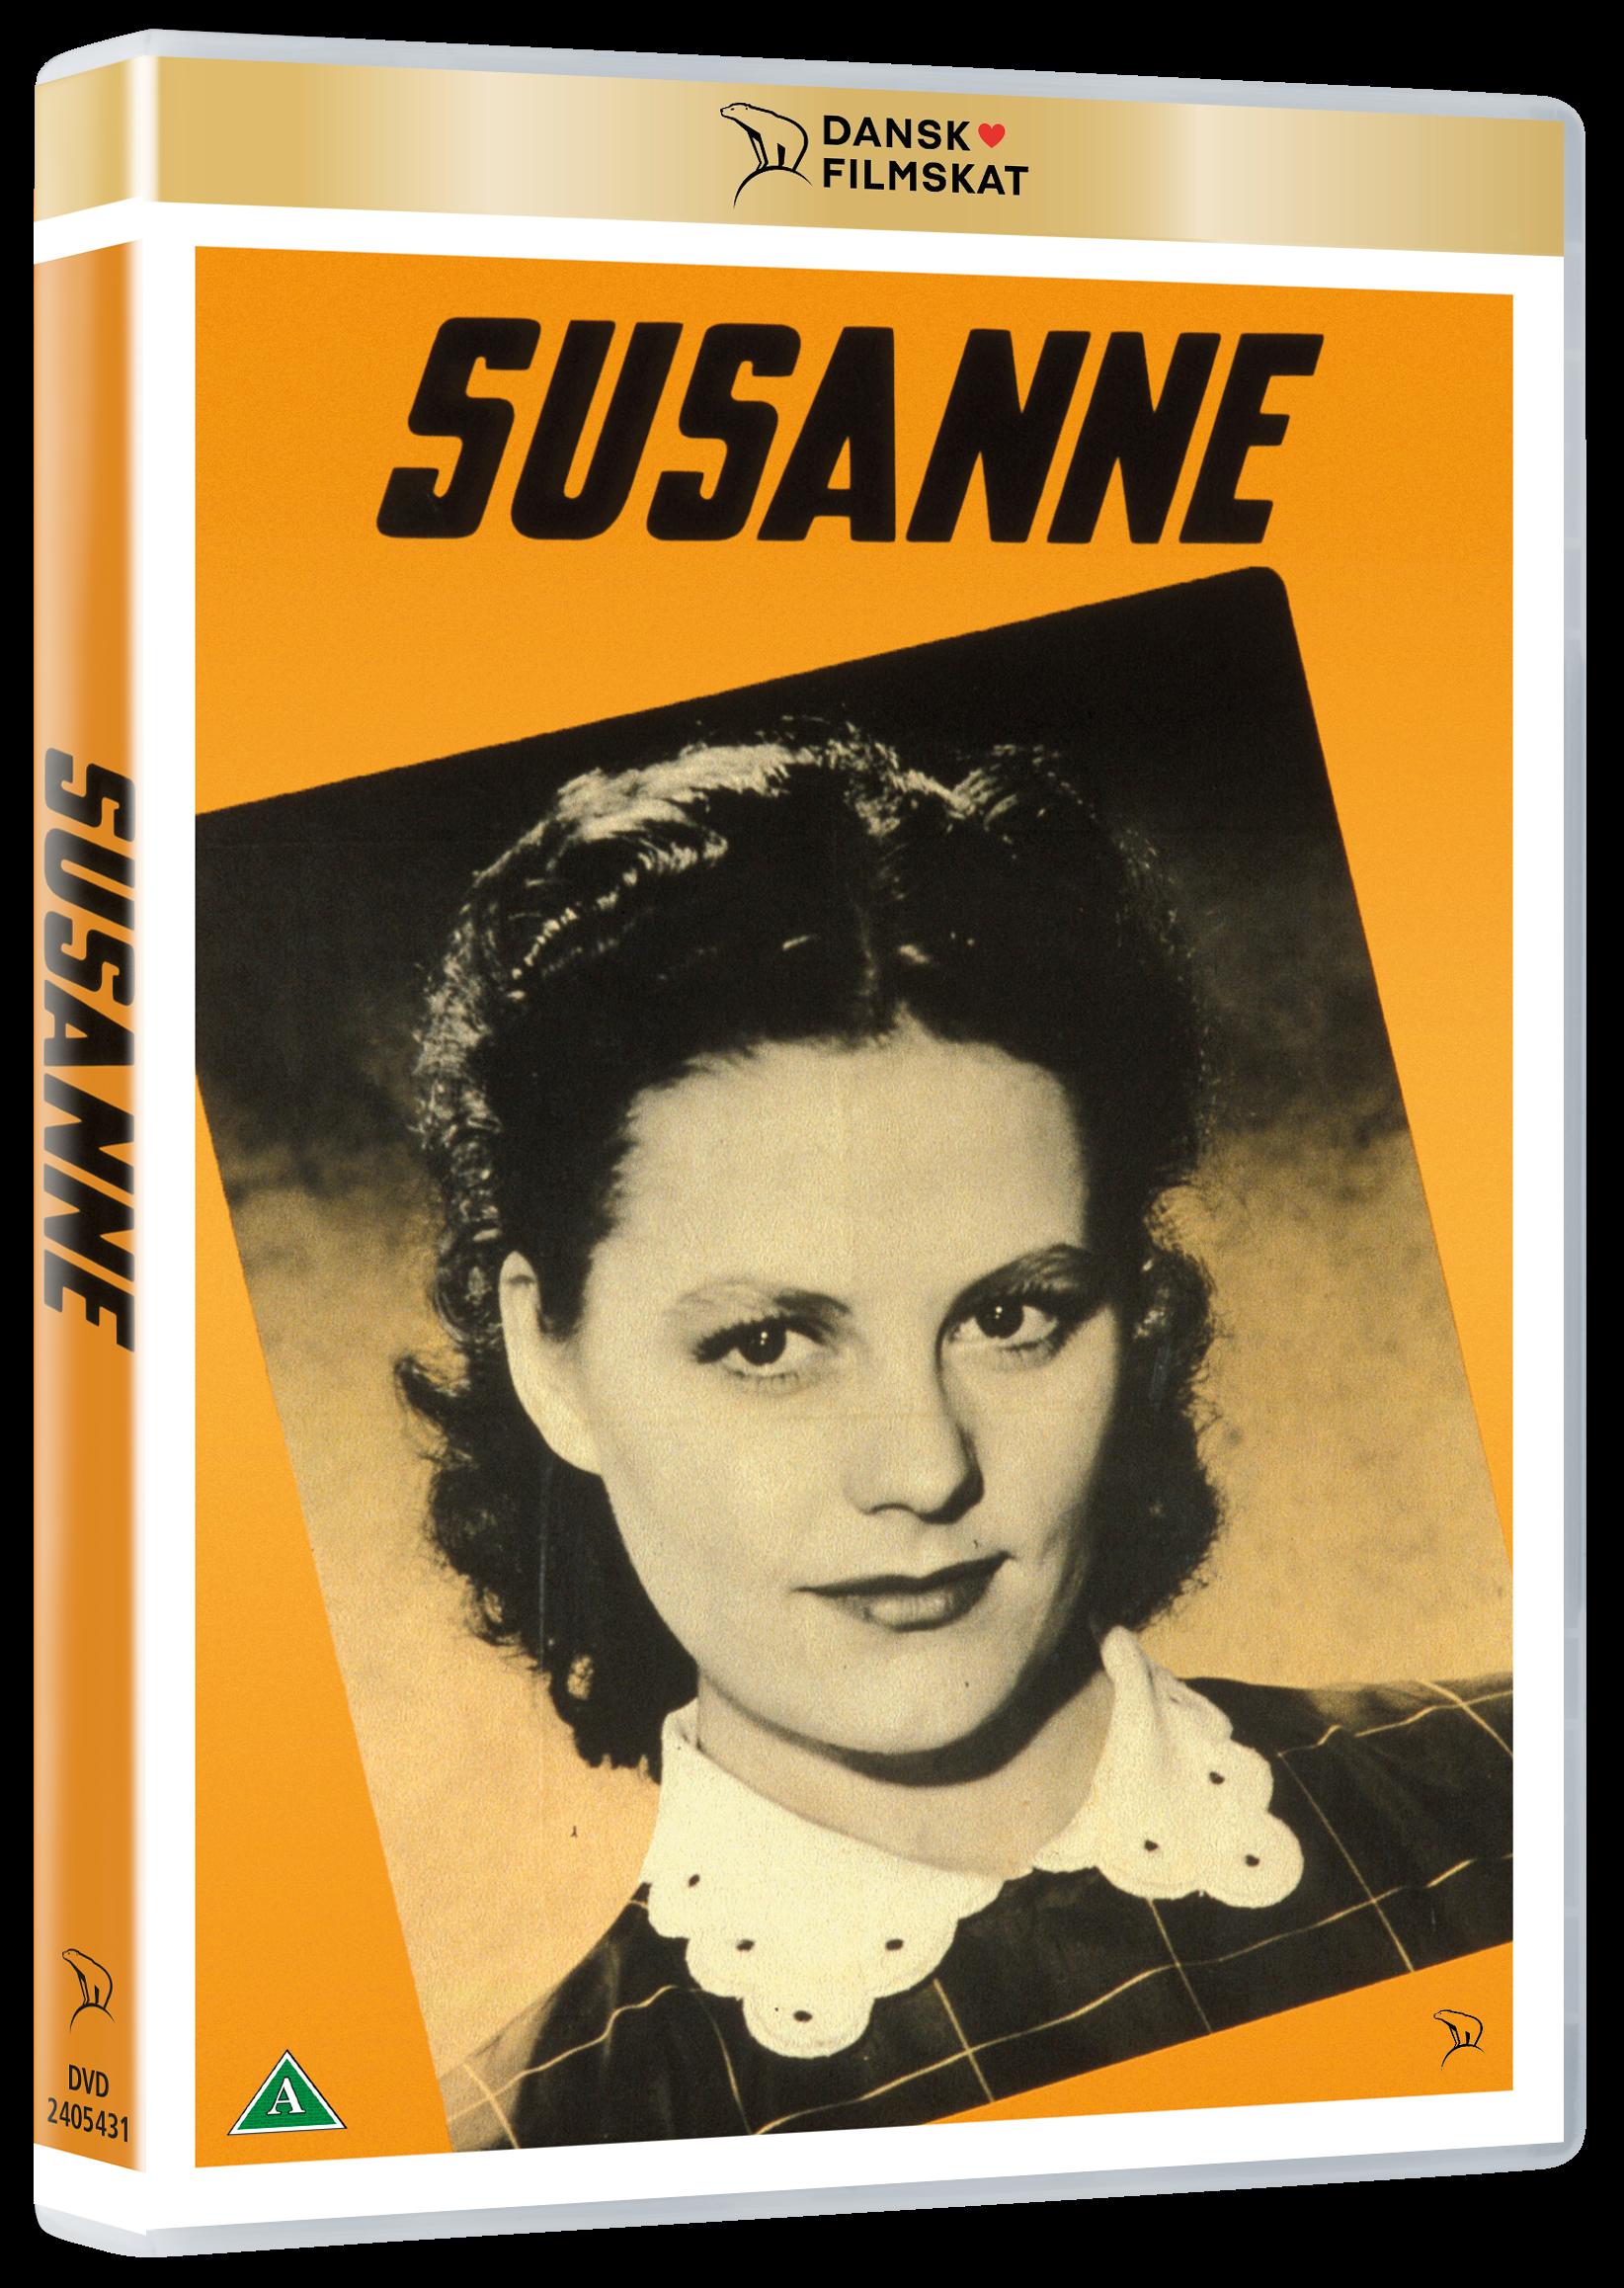 Susanne -  - Film - Nordisk Film - 5708758725651 - March 11, 2021